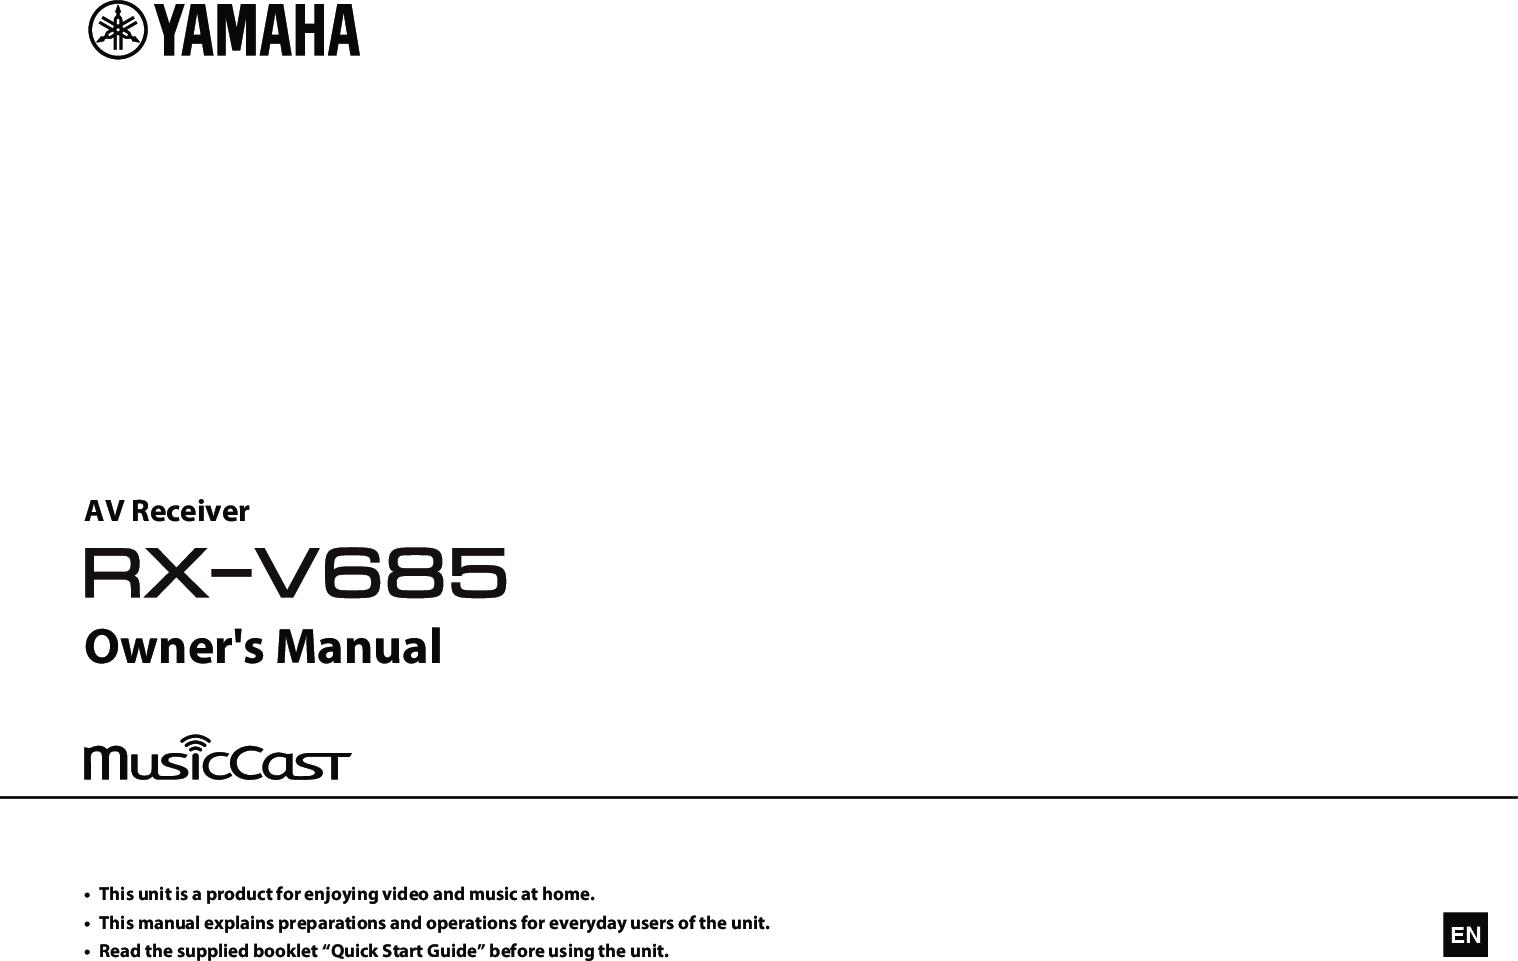 Yamaha RX V685 Owner's Manual Owner's Web AV17 0164 Om UCRABGLFH En A0